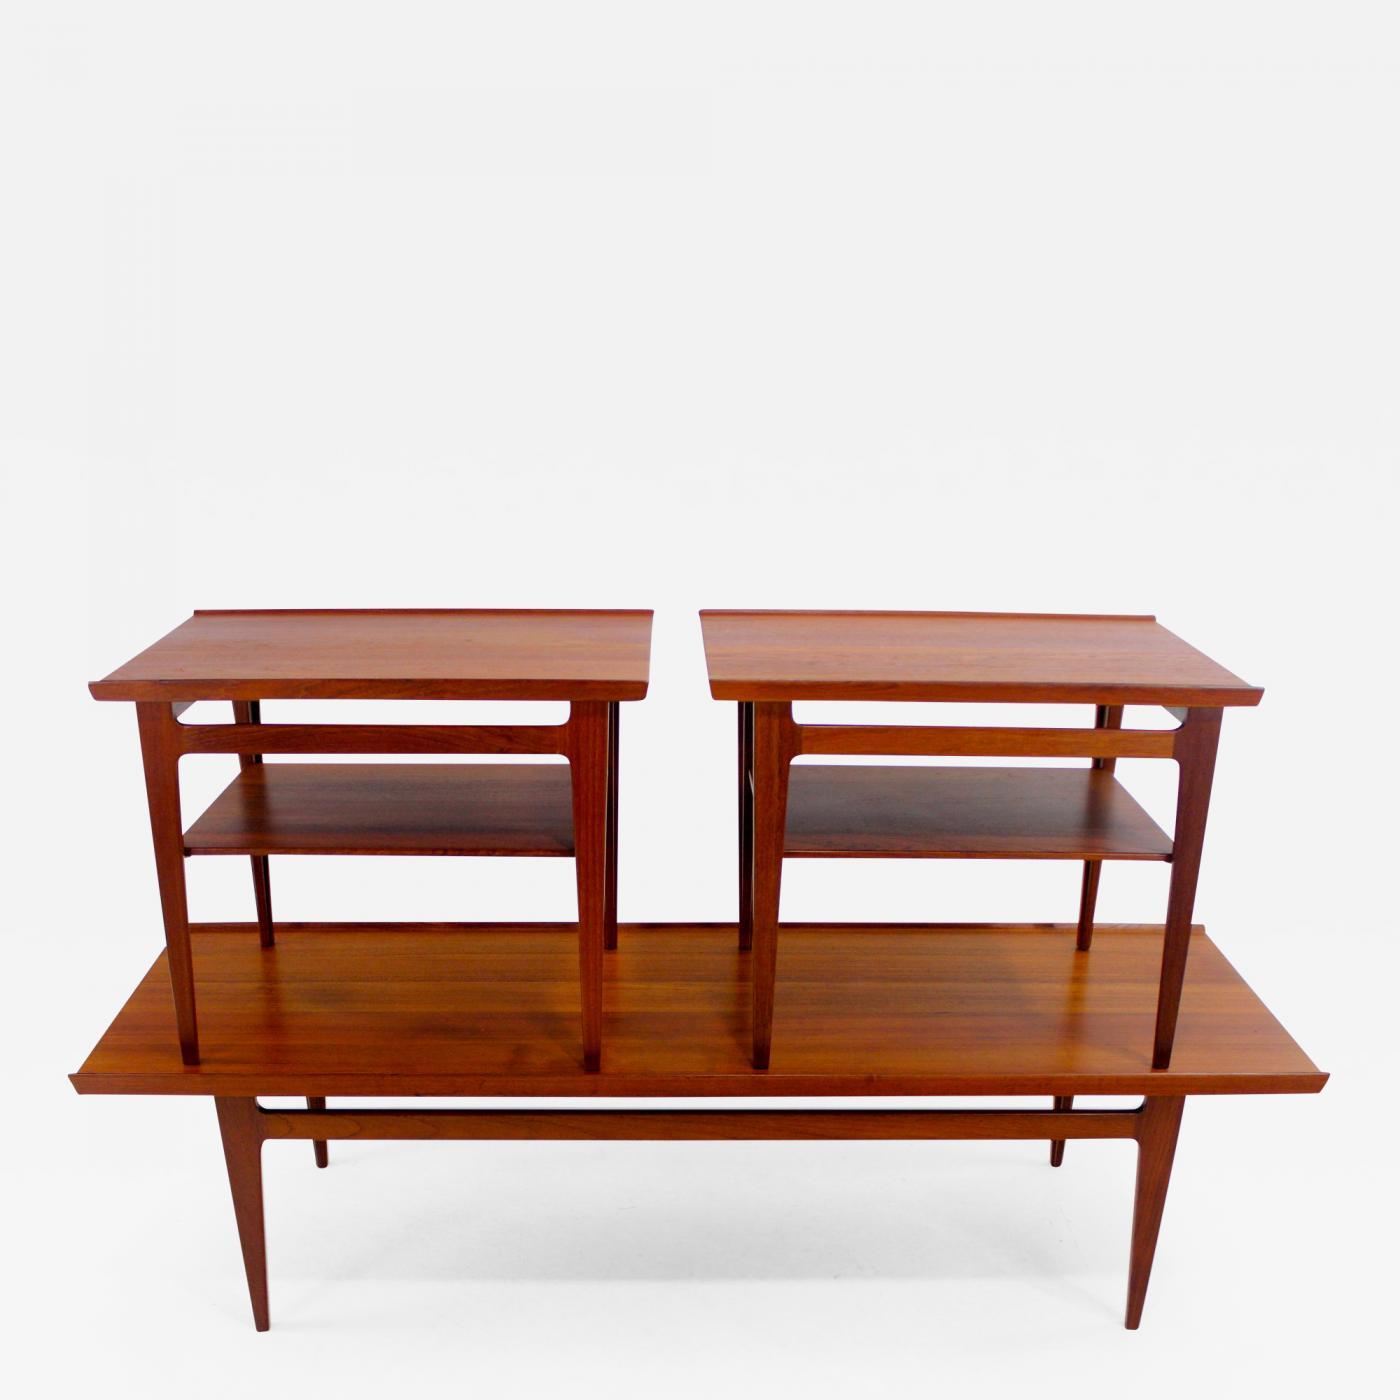 Fabulous Finn Juhl Solid Teak Danish Modern Coffee End Table Set Designed By Finn Juhl Pabps2019 Chair Design Images Pabps2019Com